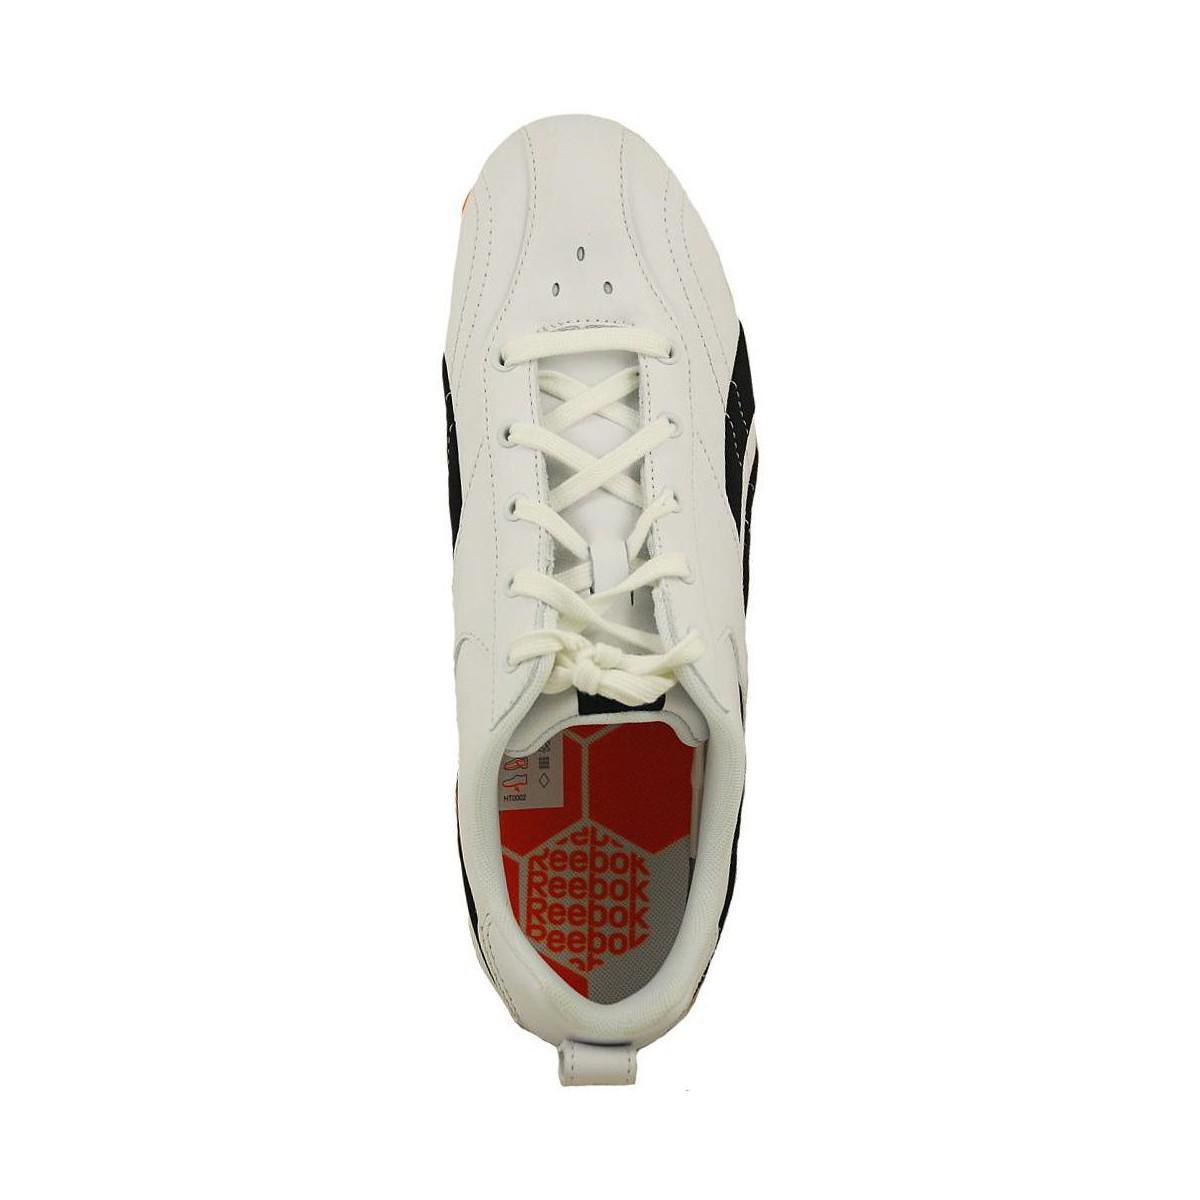 Reebok Exsporter Women's Football Boots In White